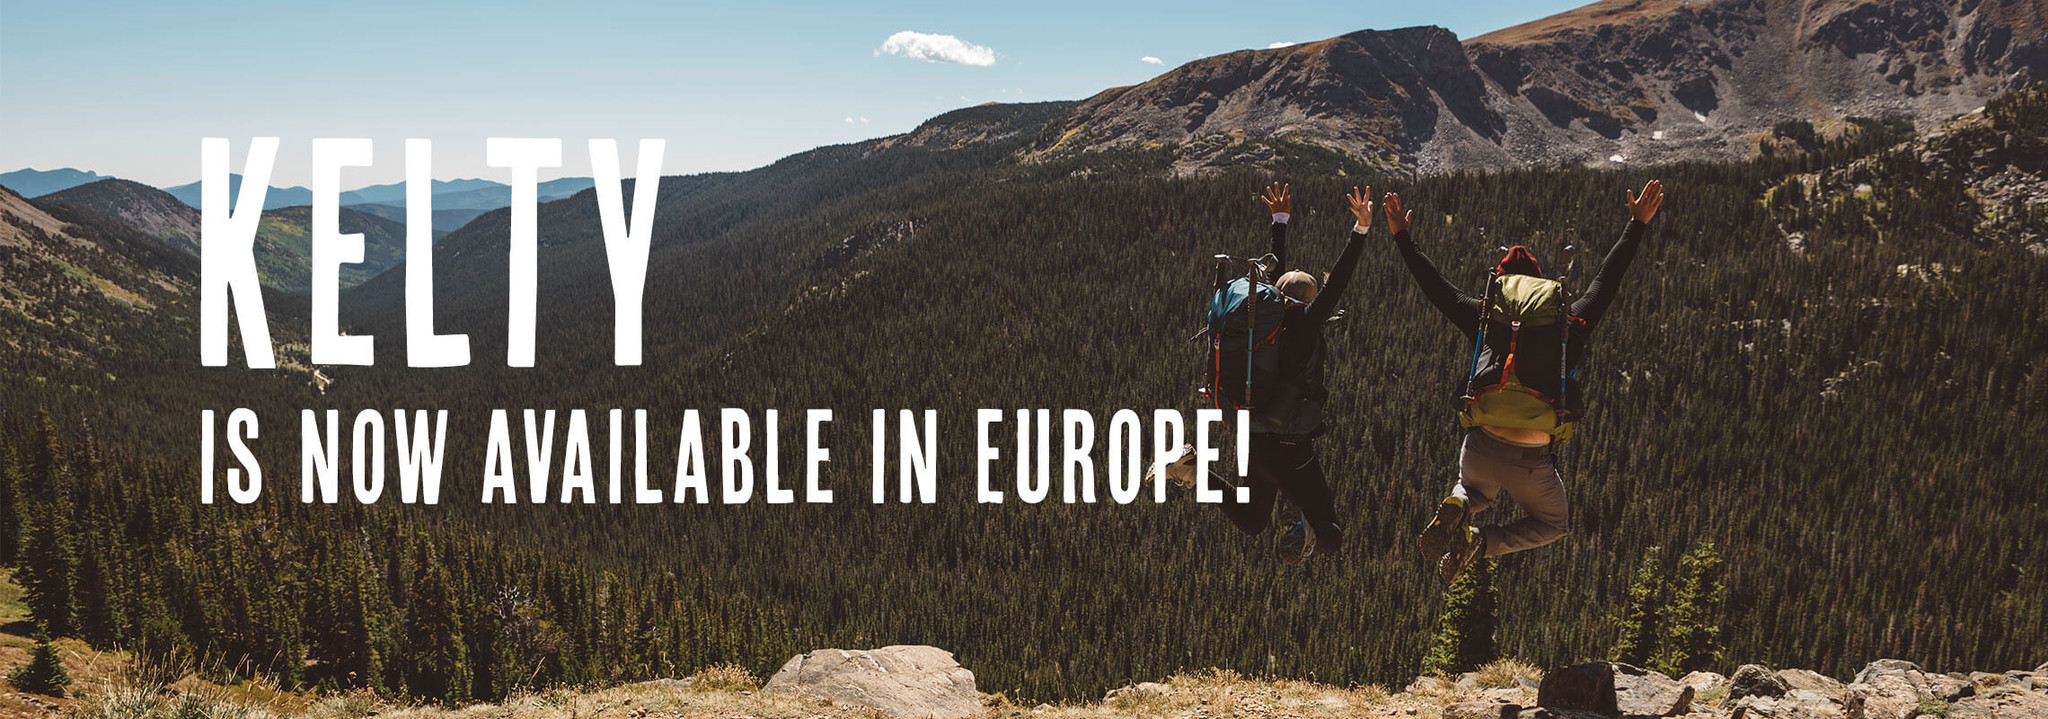 Kelty Europe - Kelty Europe